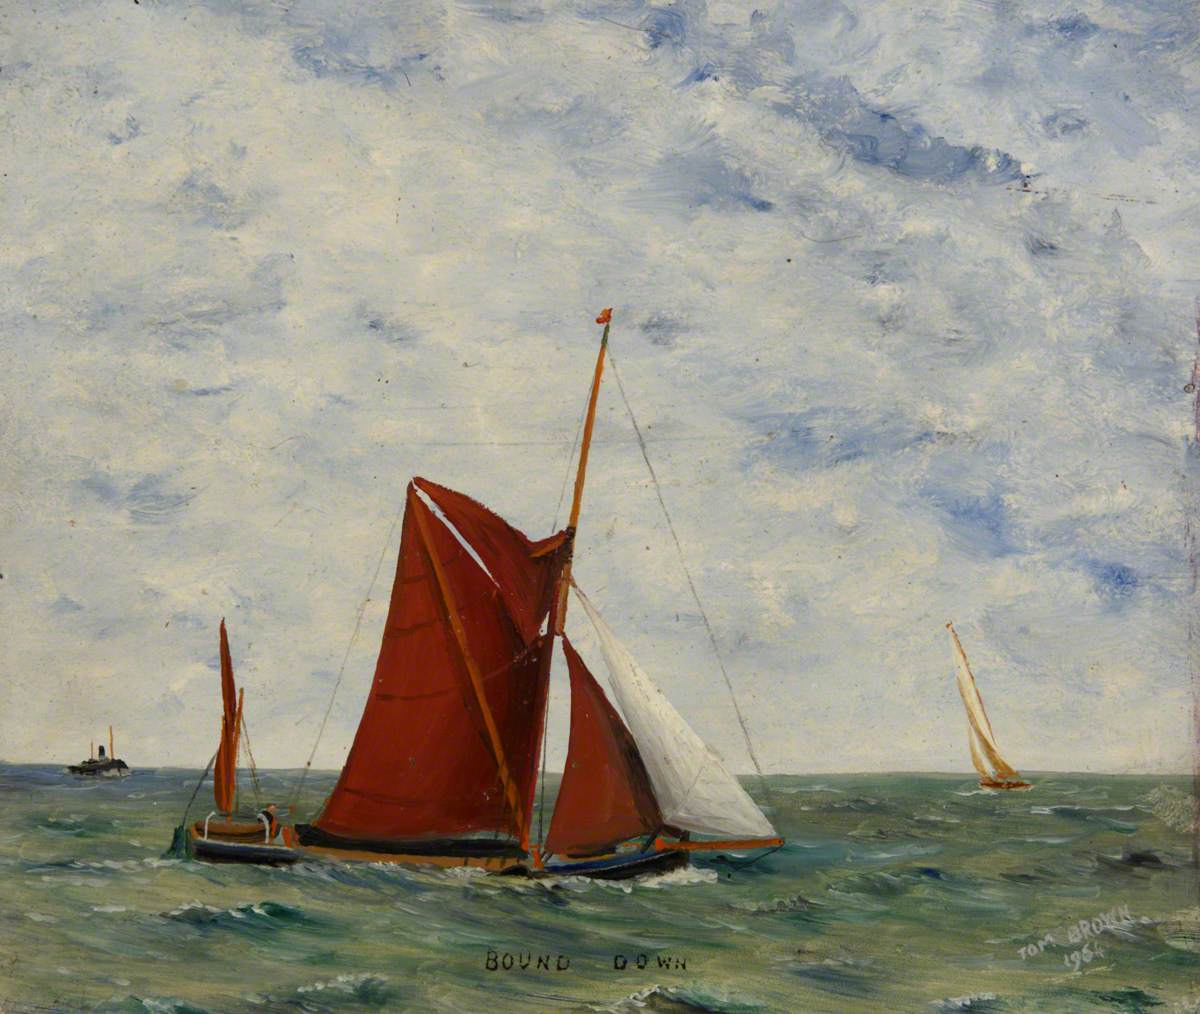 A Sailing Barge